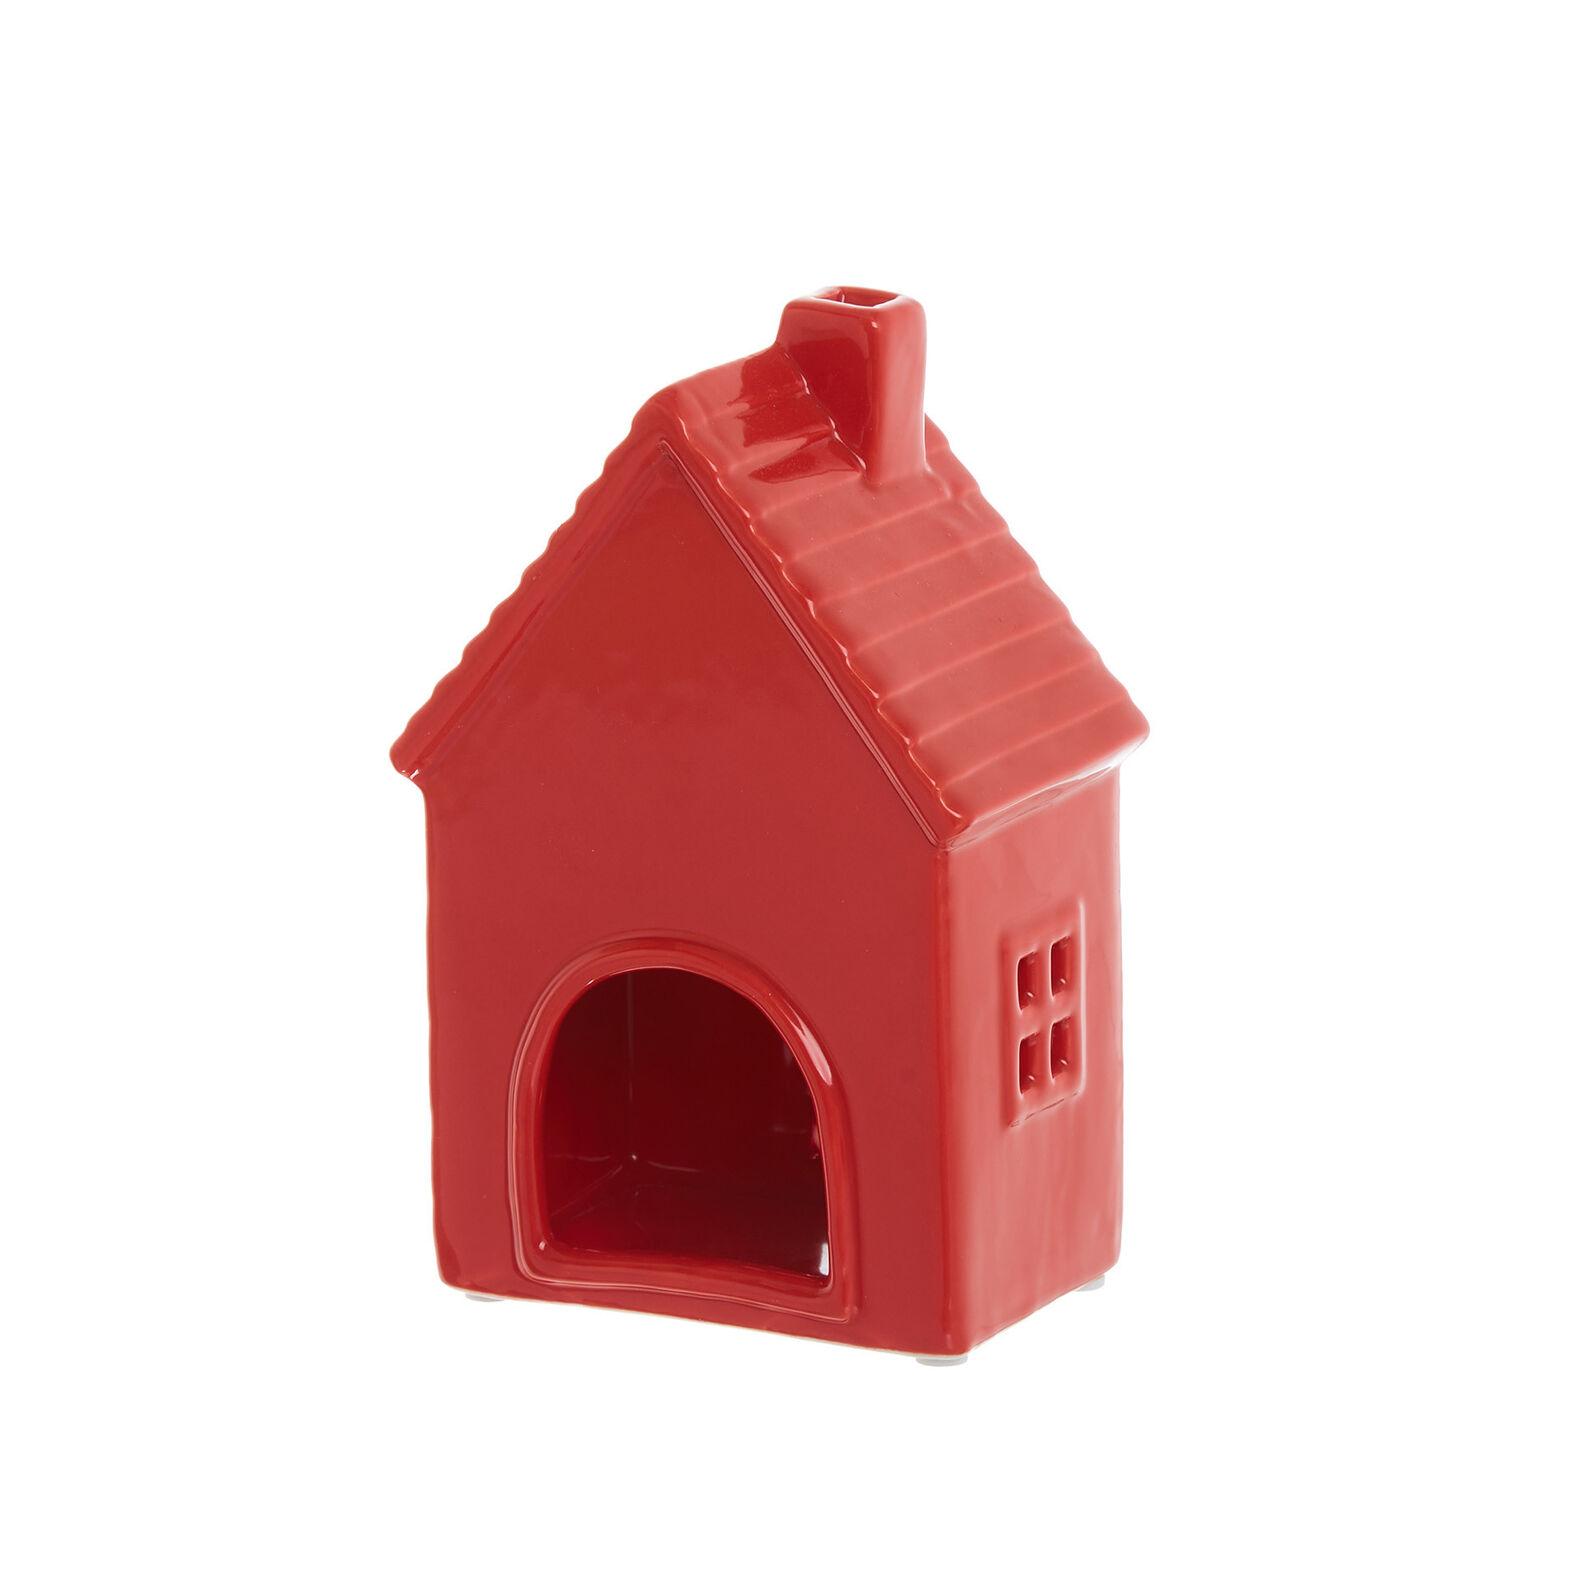 House-shaped porcelain lantern